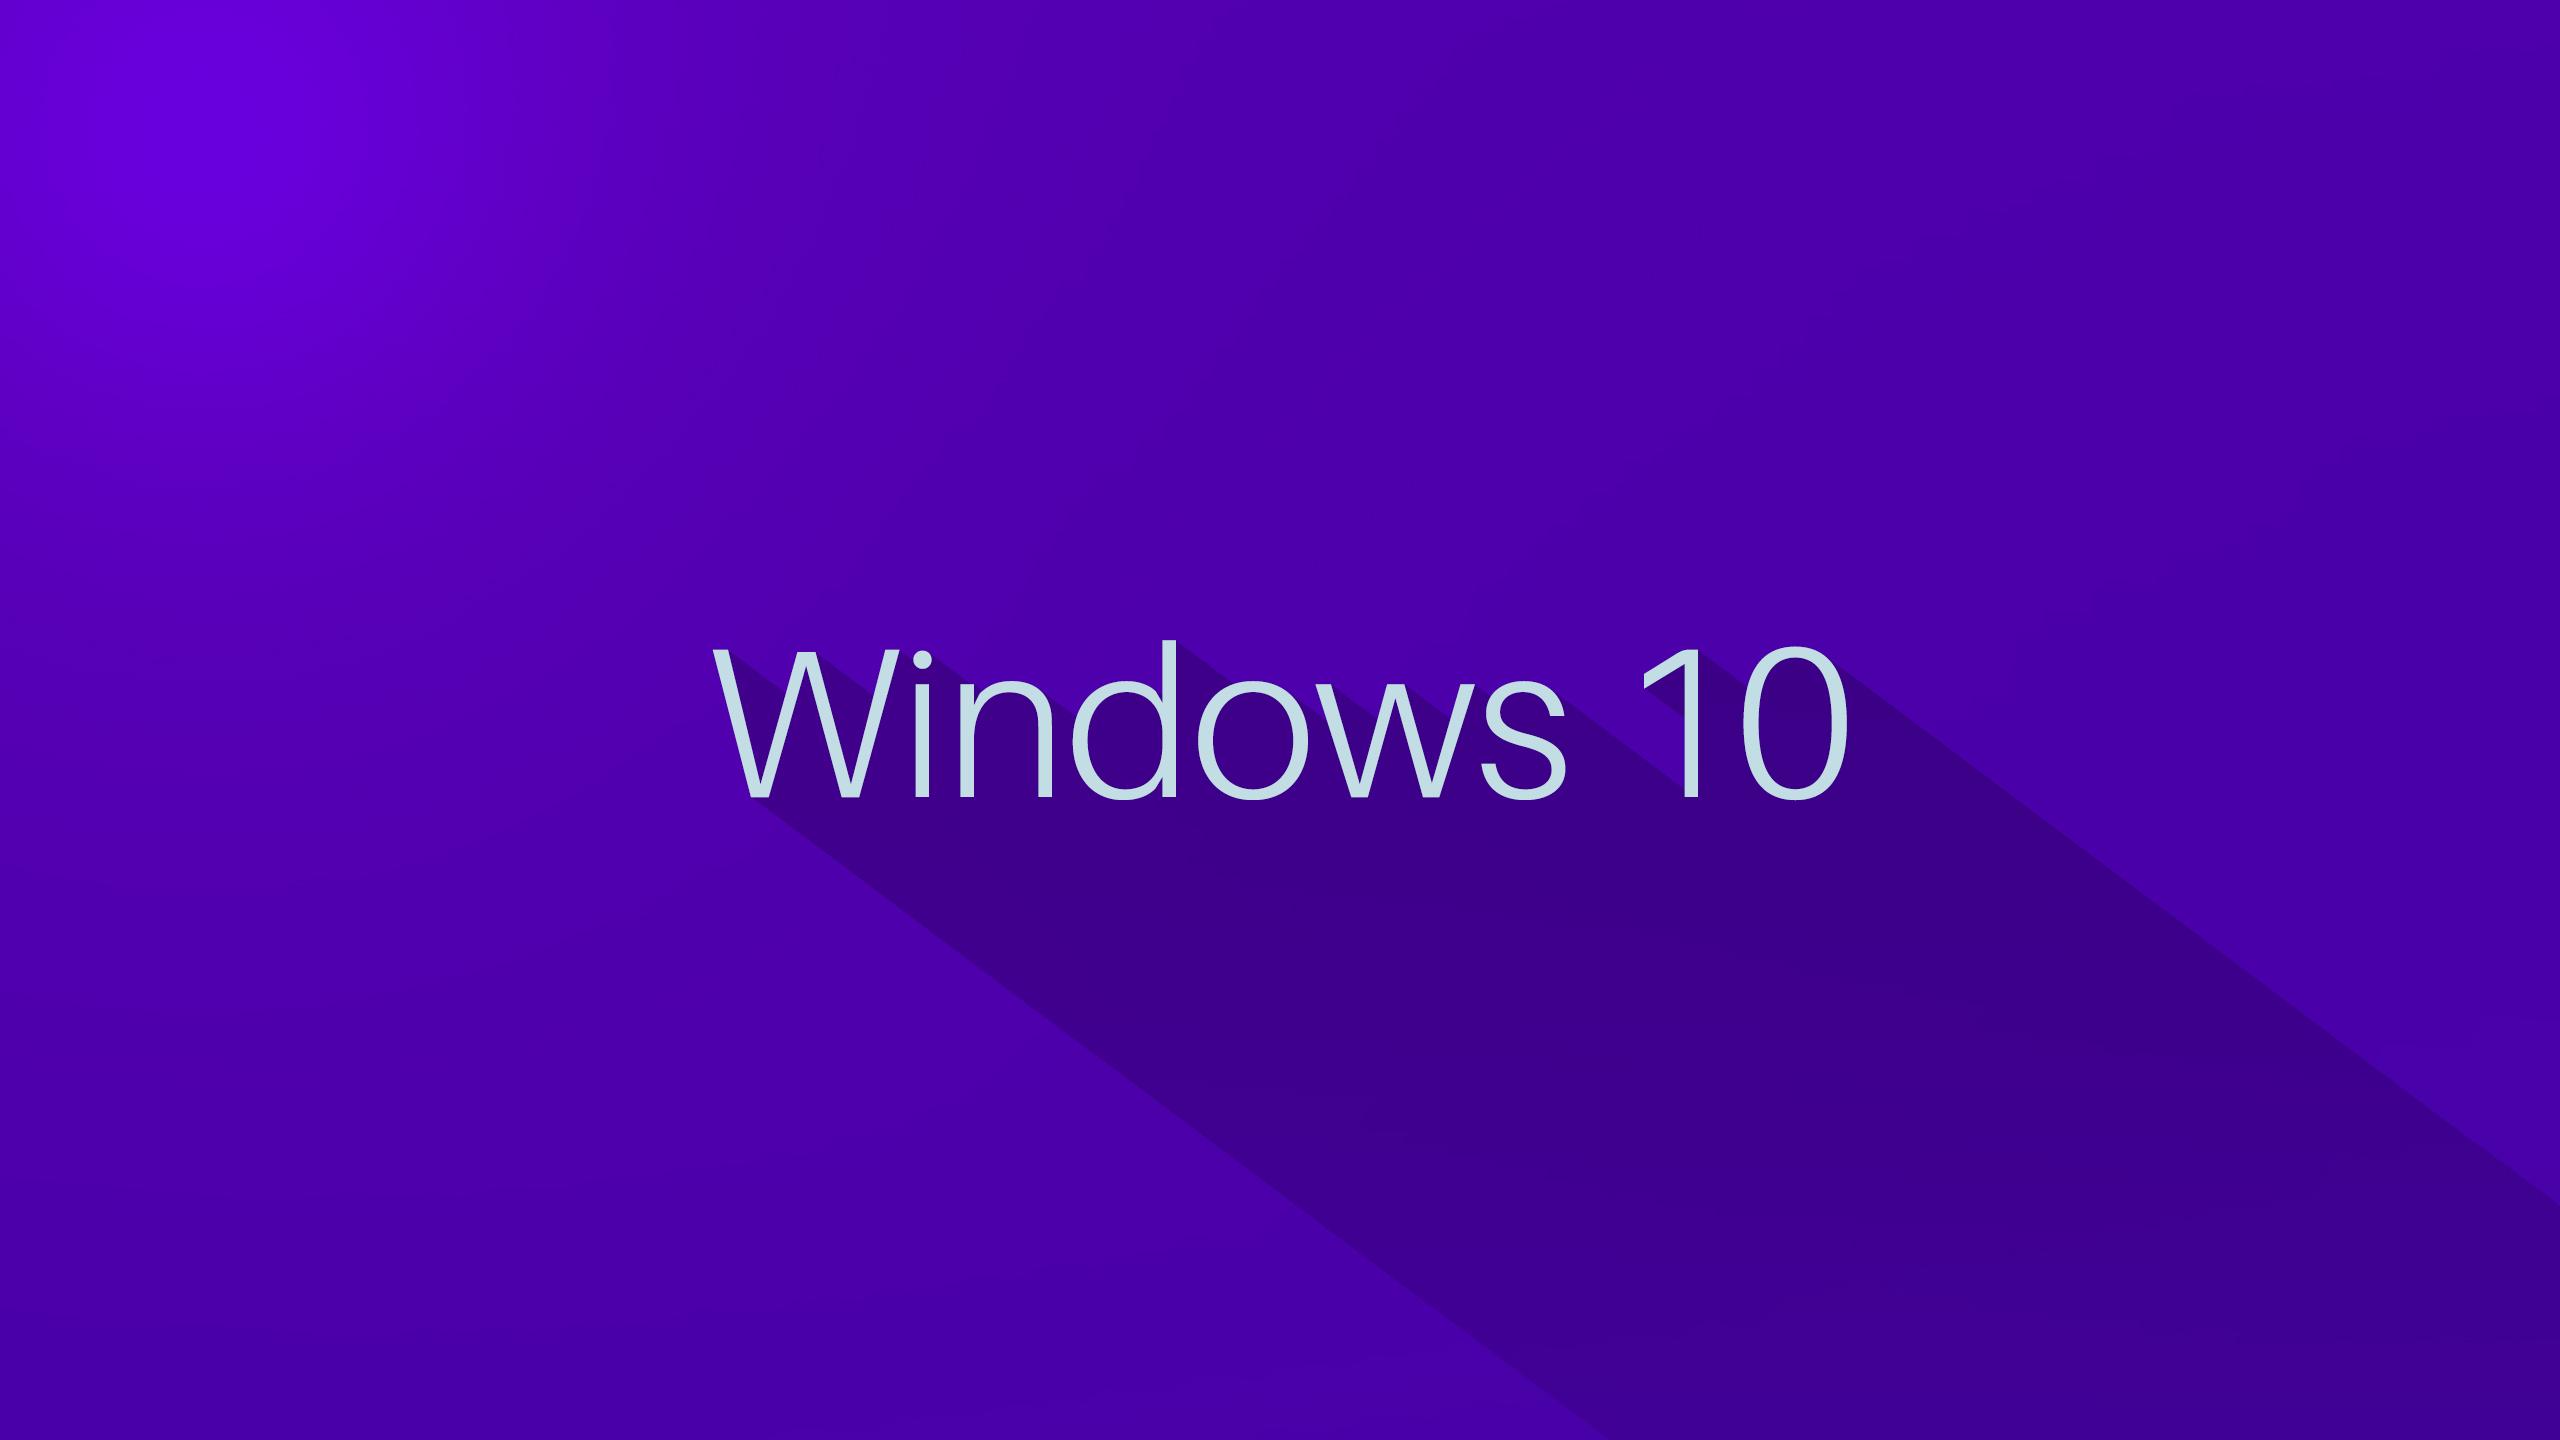 Windows 10 Wallpaper 1080p Full Hd Logo On Purple Background